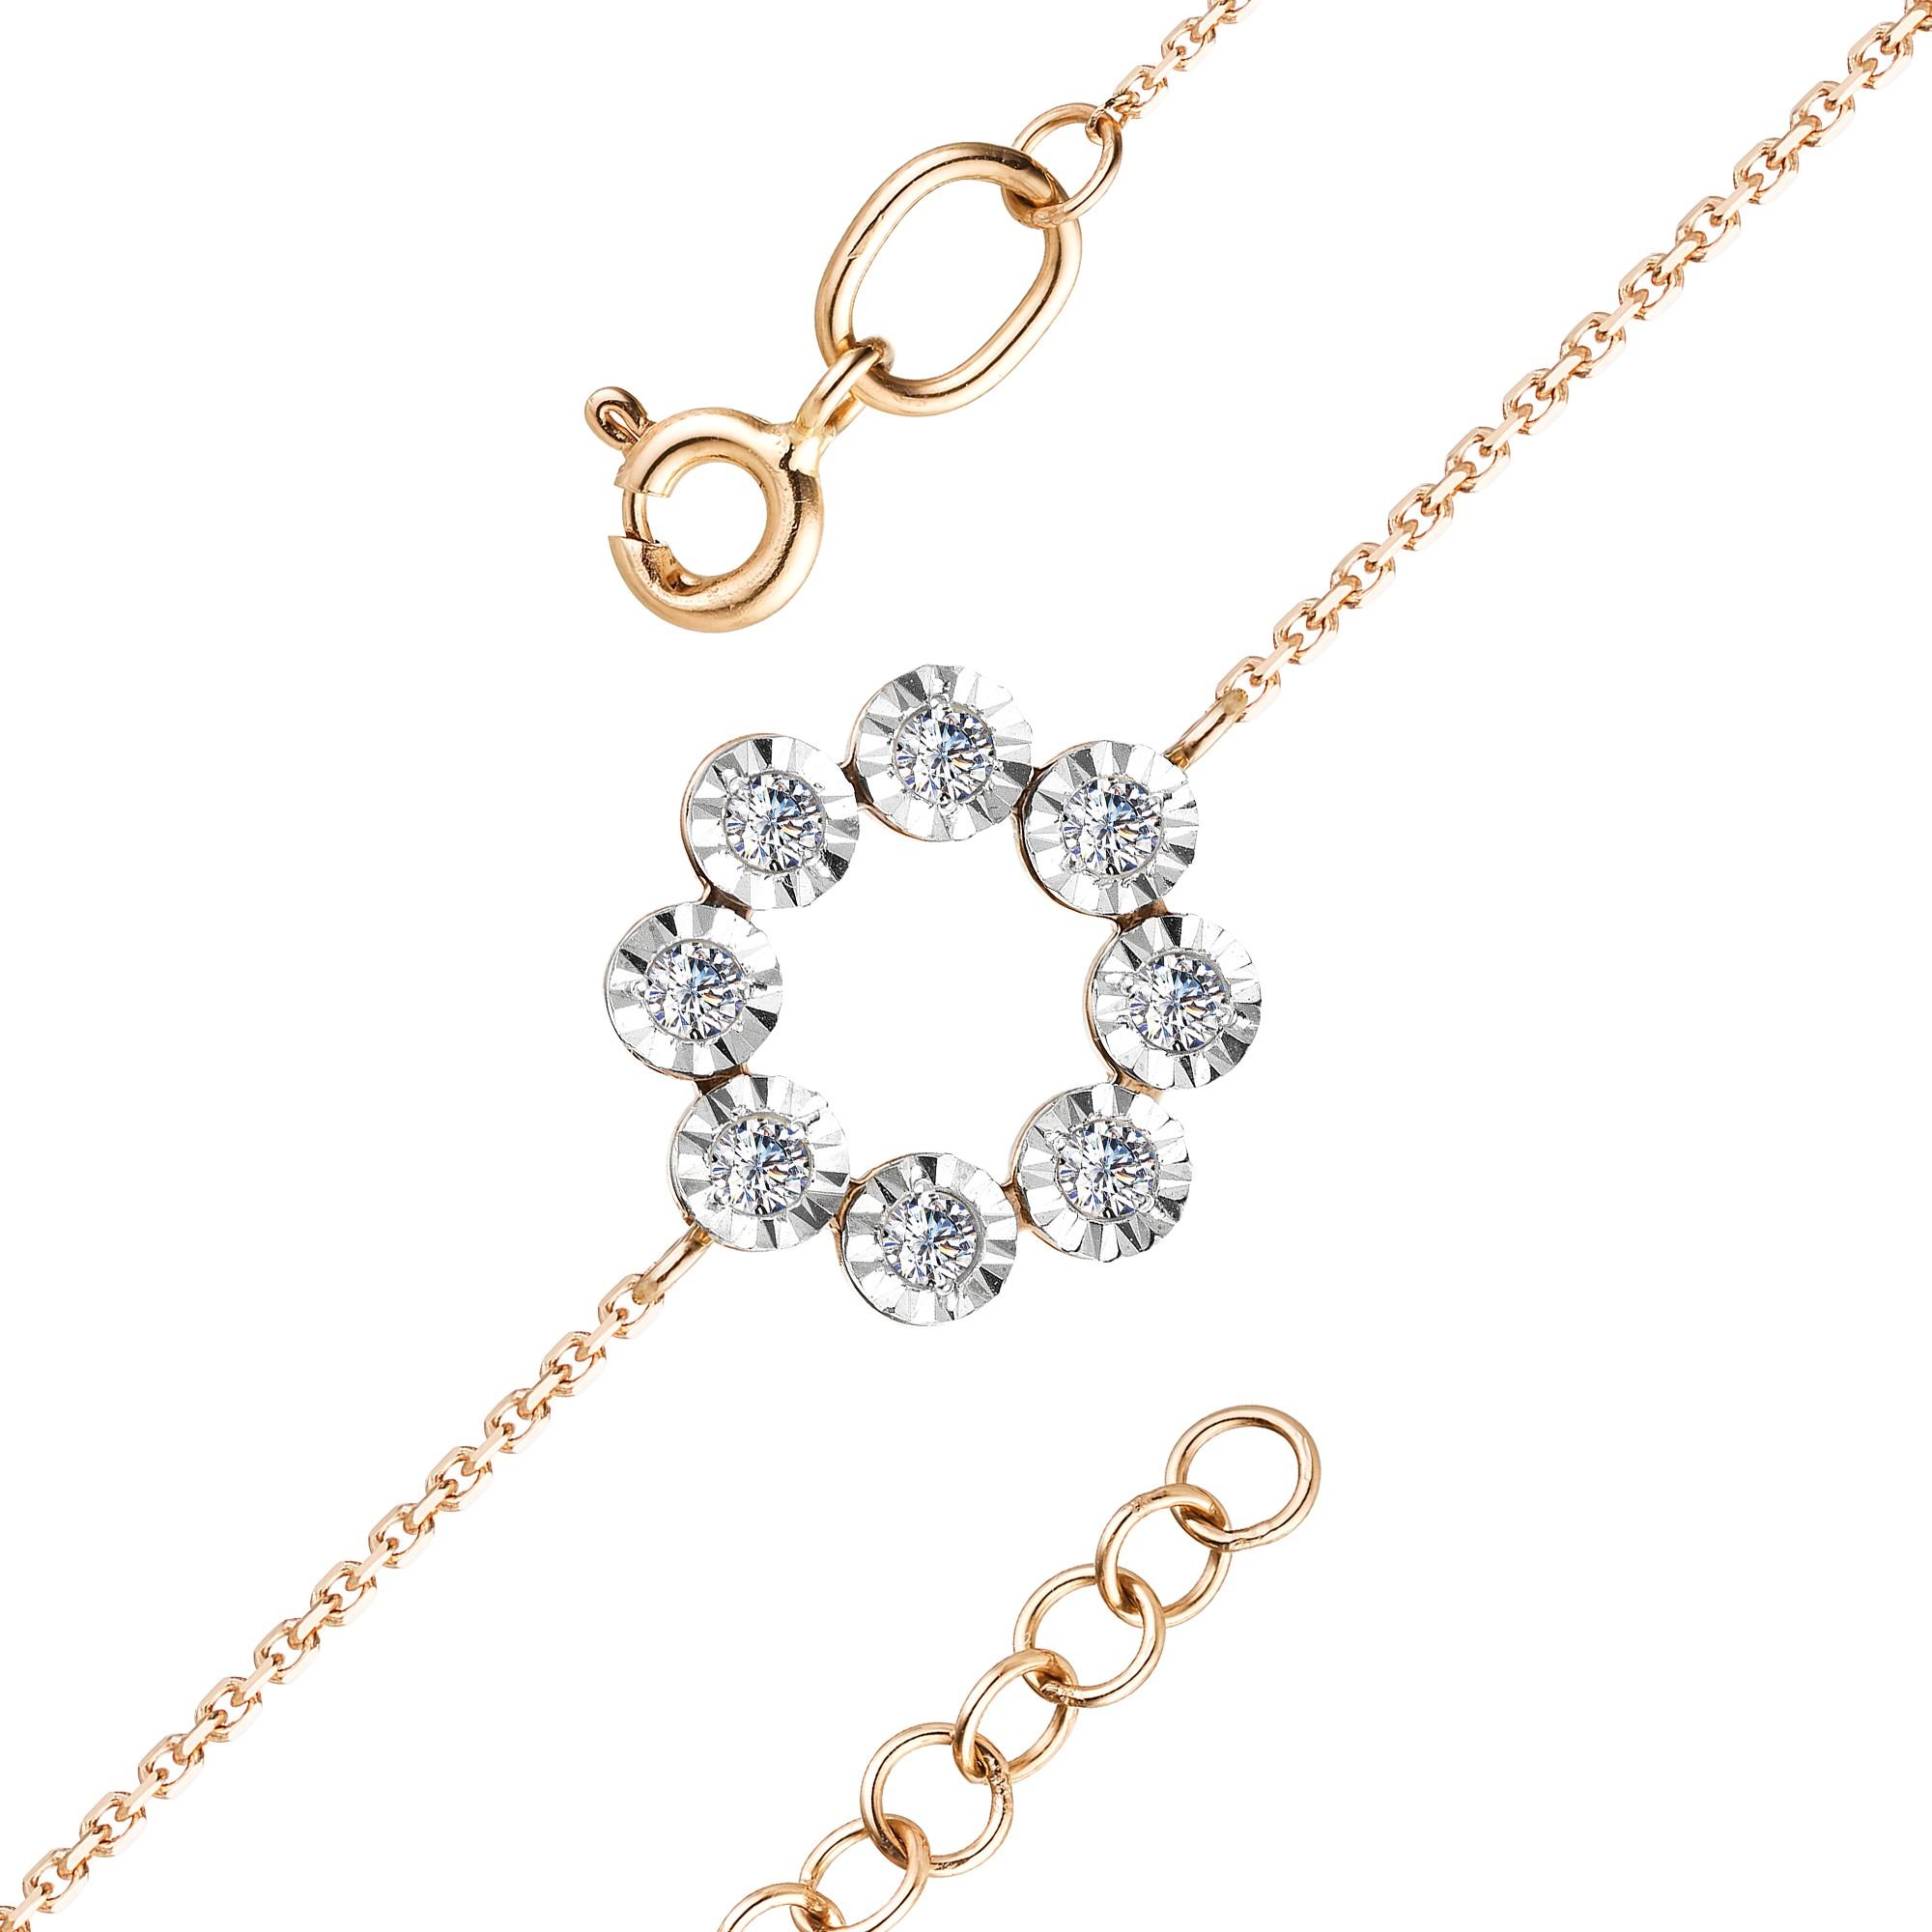 картинка браслет 53232-100 8 бриллиант круг 17 0,159 40-60 2/3а 53232-100